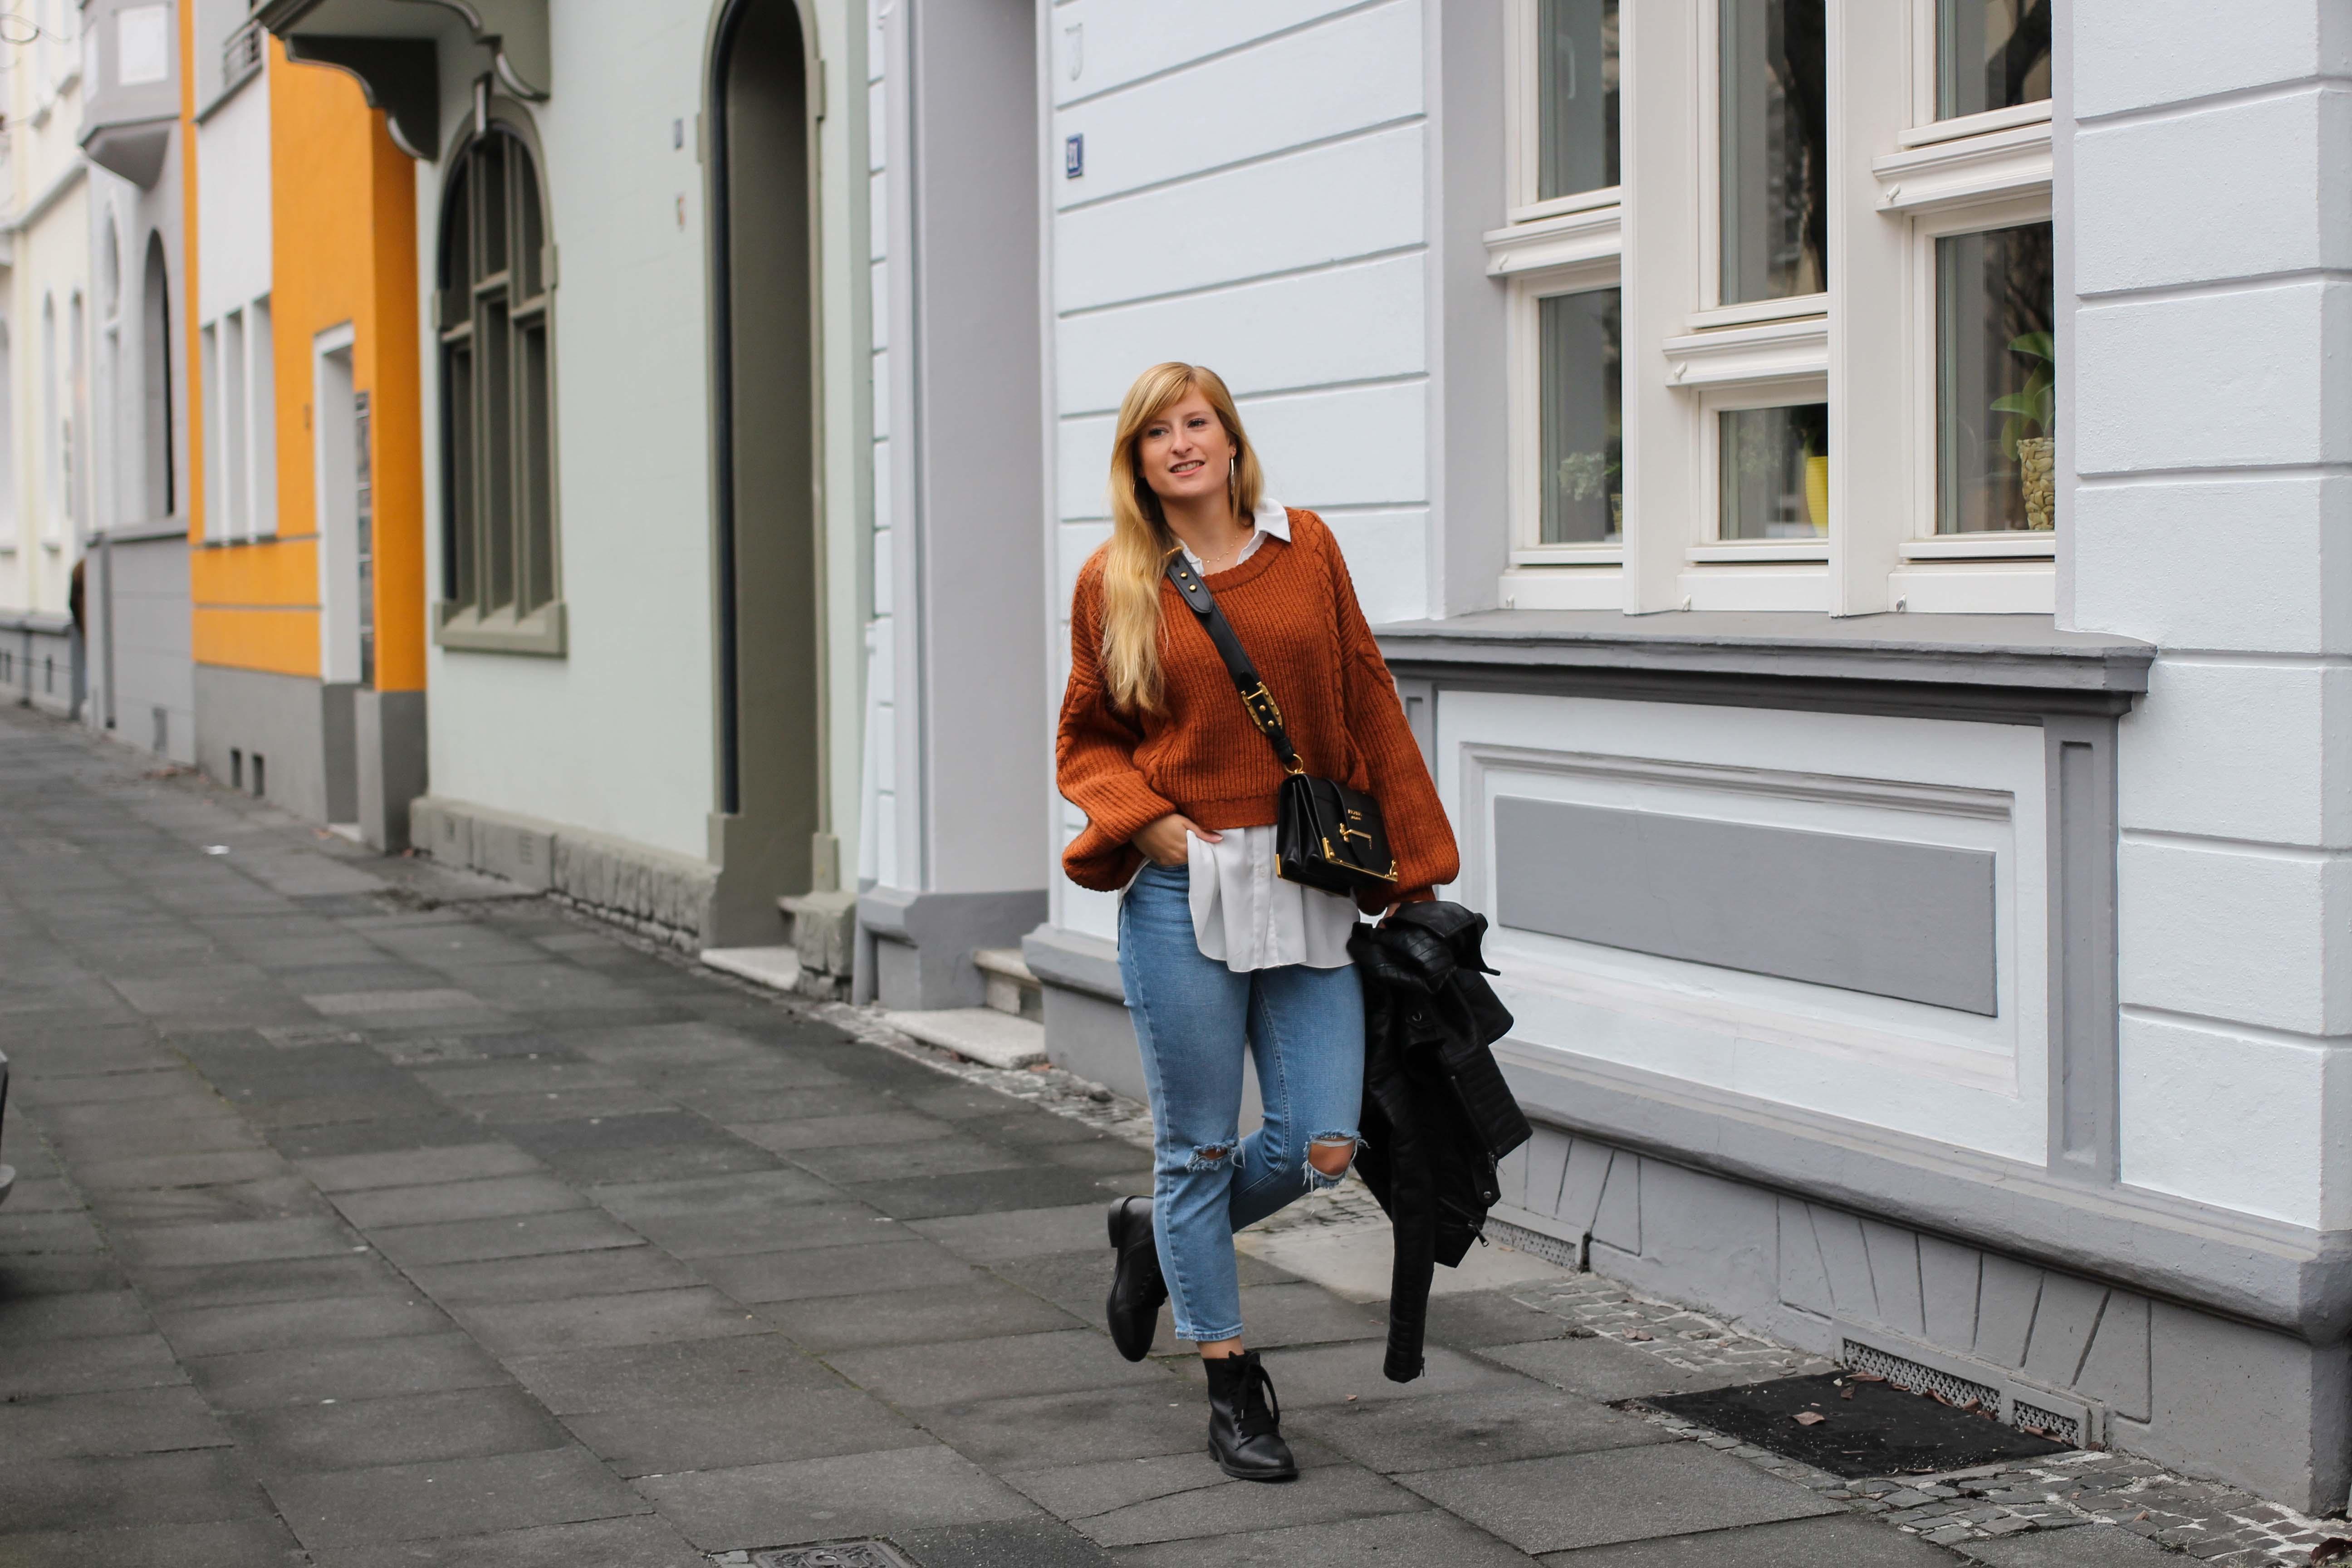 Übergangslook Crop Wollpullover Layering Bluse kombinieren zerrissene Jeans Modeblog Outfit Streetstyle Köln 3